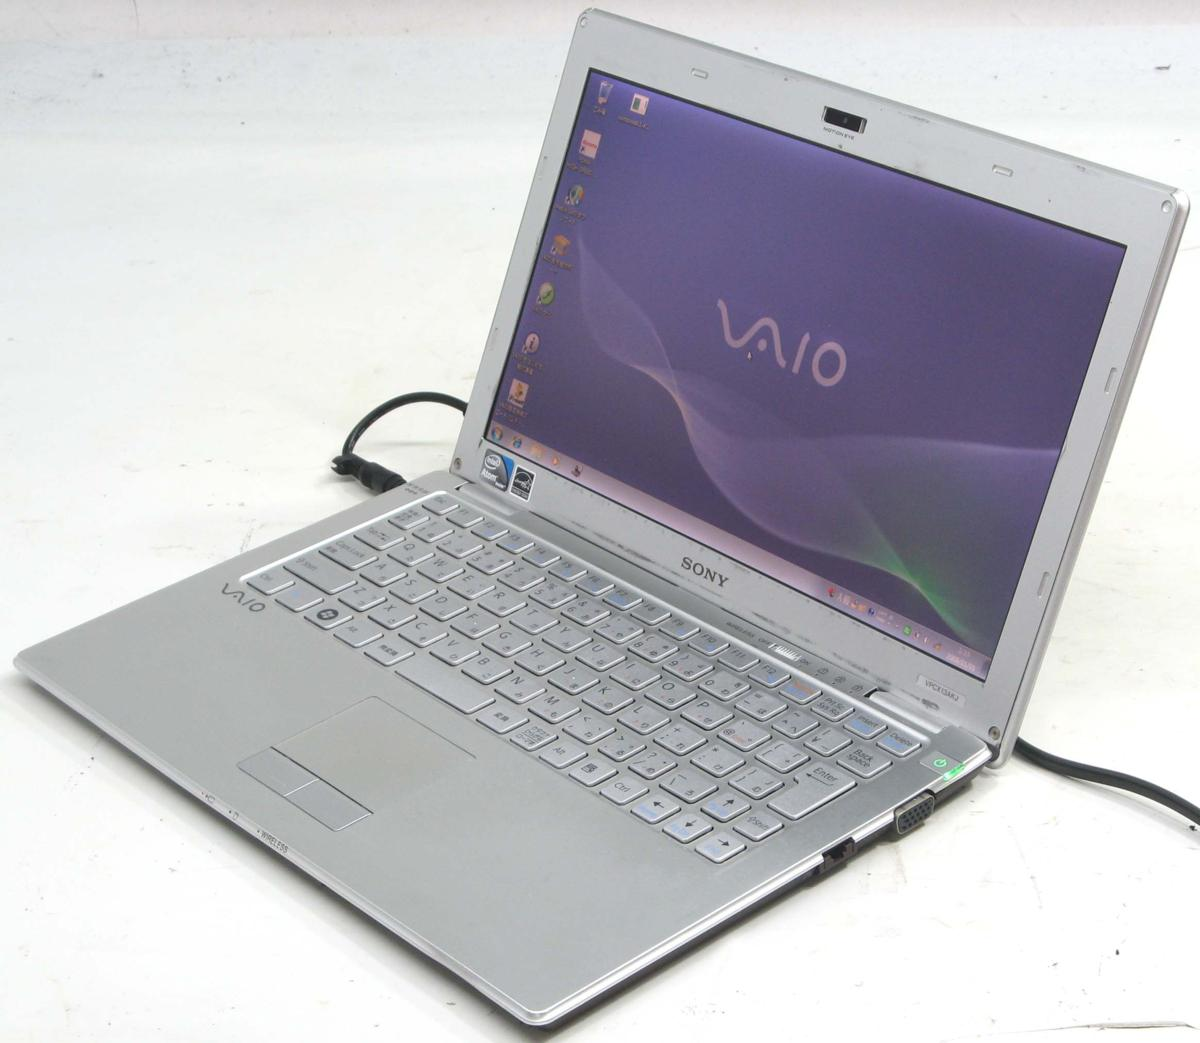 SONY【SSD搭載】VAIO VPCX13AKJ(ソニー Windows7 SSD搭載)【中古】【中古パソコン/中古PC】